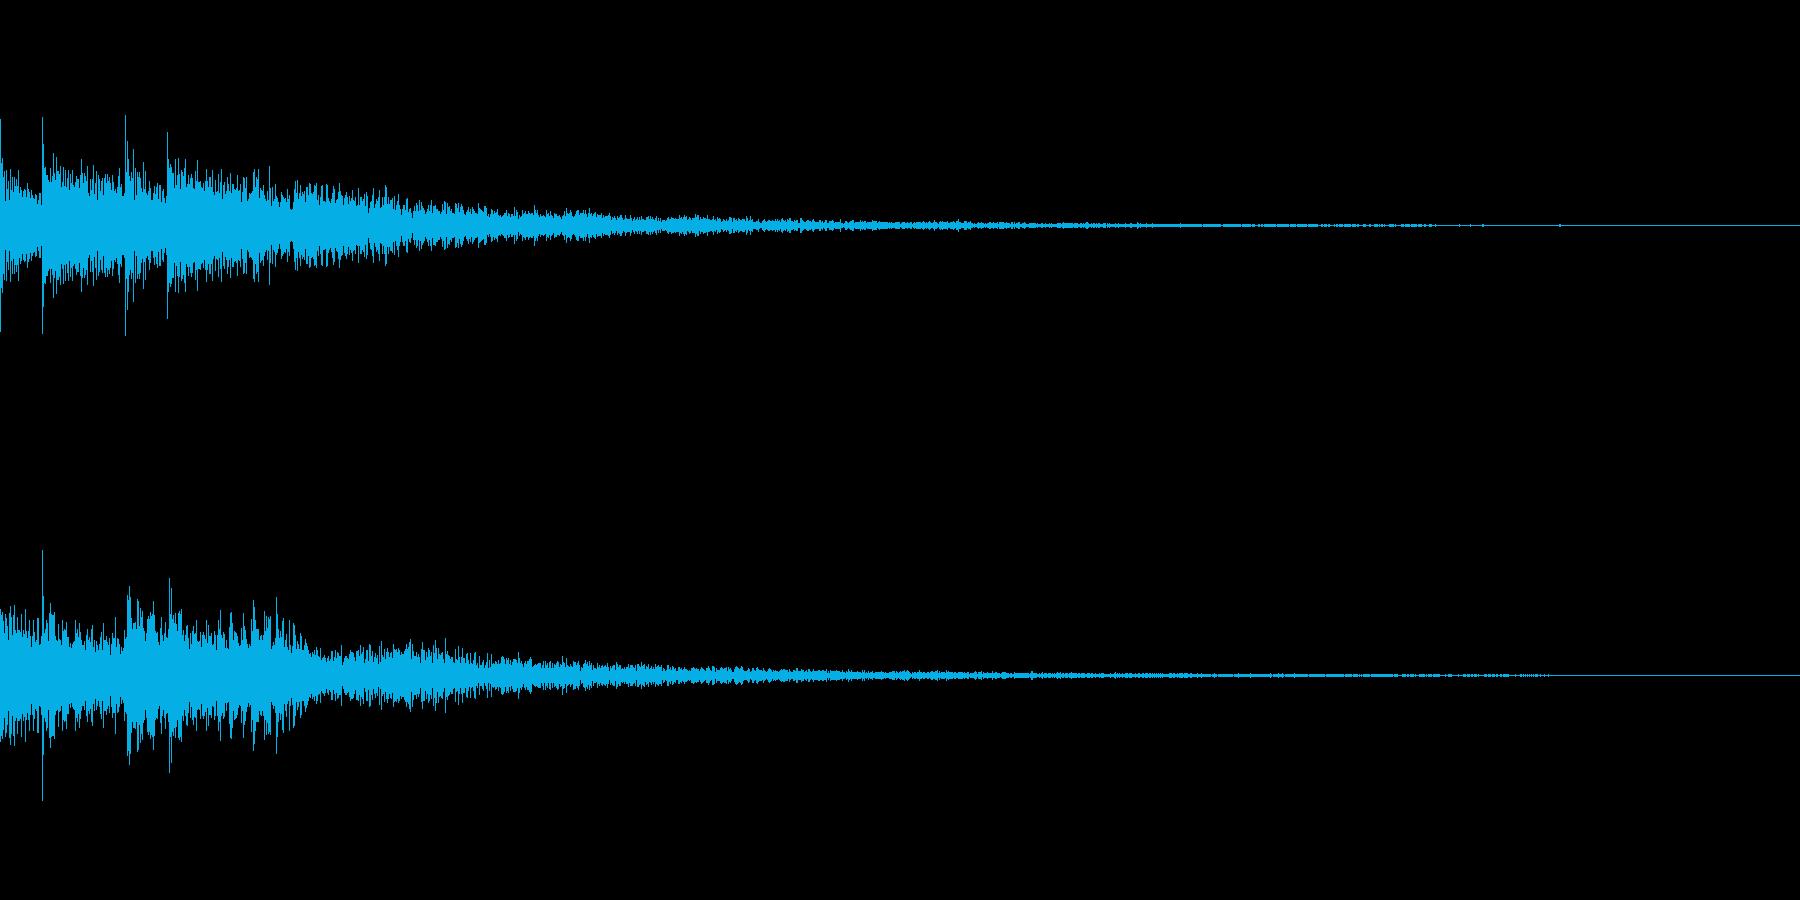 Push ゲーム コマンド ボタン SEの再生済みの波形